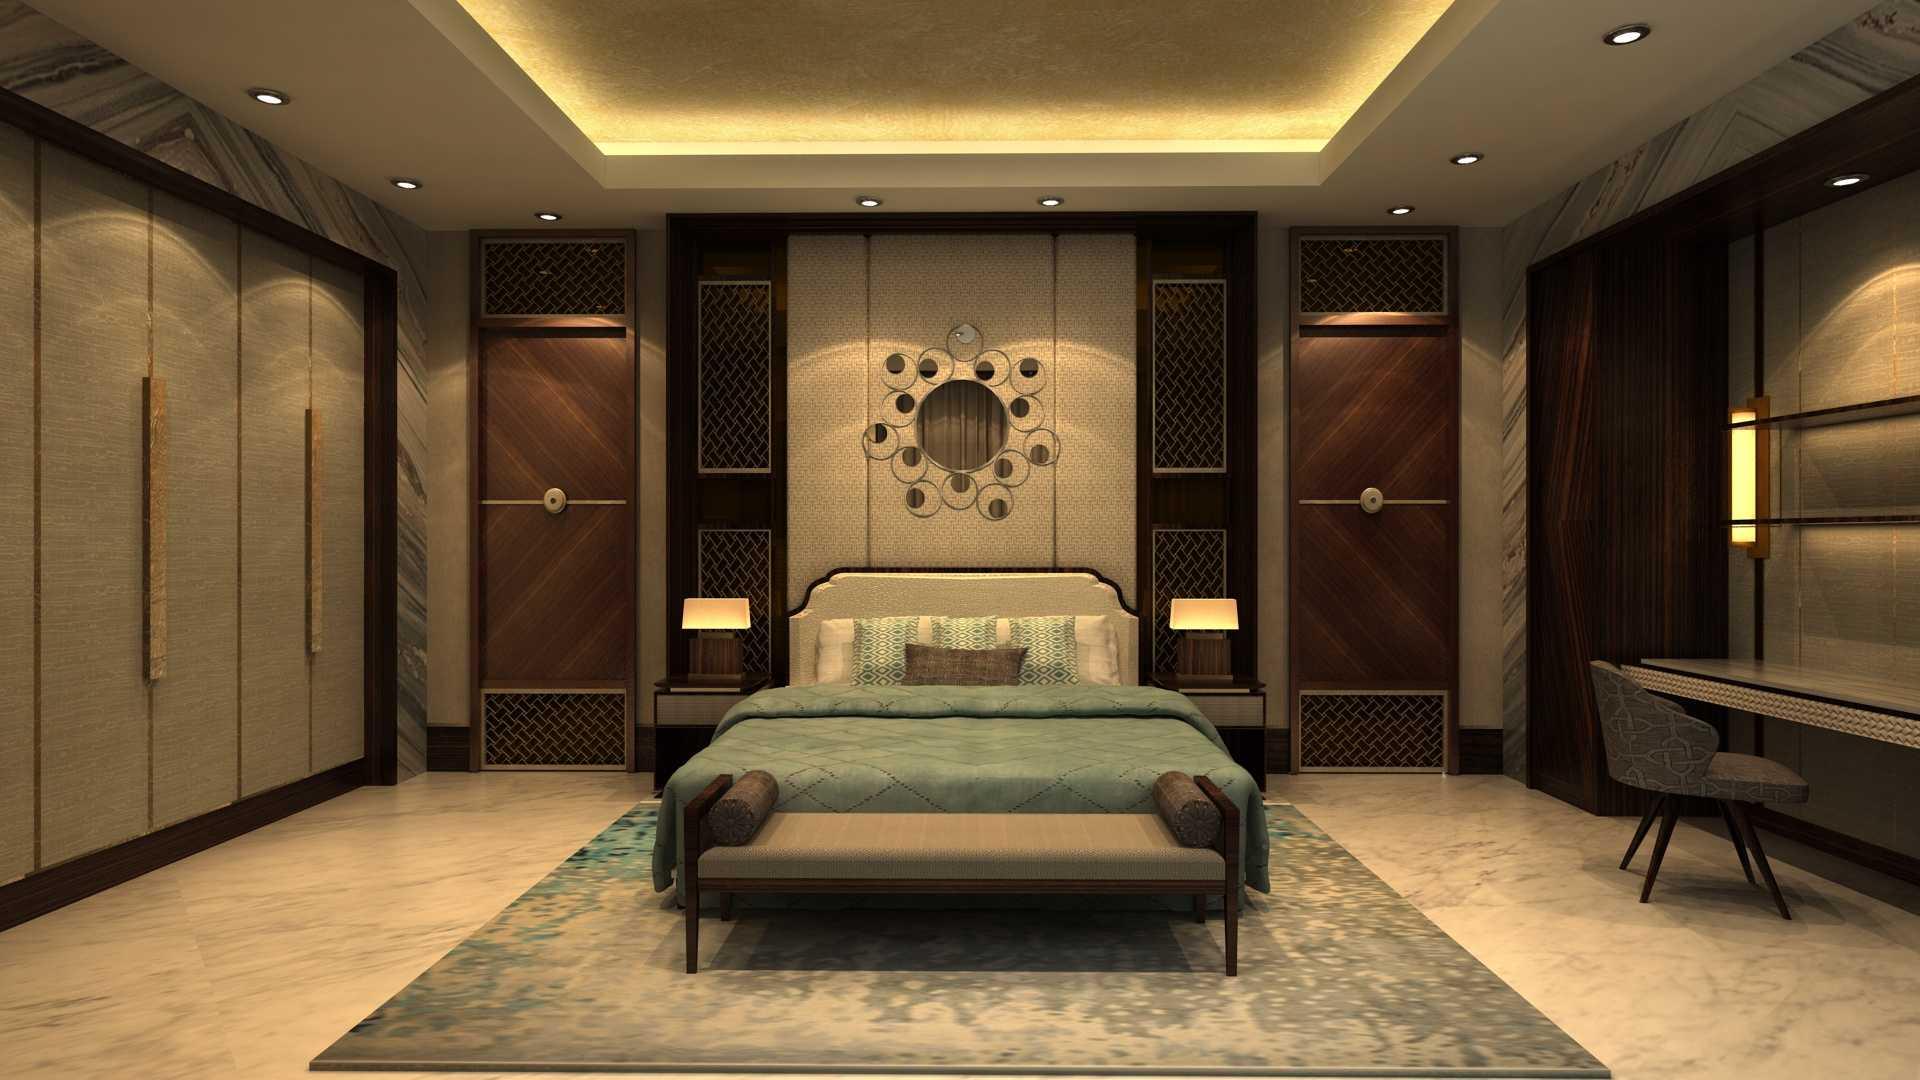 Vin•da•te Mayang Permai Residence Ii - Residential Project (Artist Impression - Construction In Progress) Pantai Indah Kapuk - North Jakarta Pantai Indah Kapuk - North Jakarta Lt Kontemporer  17235